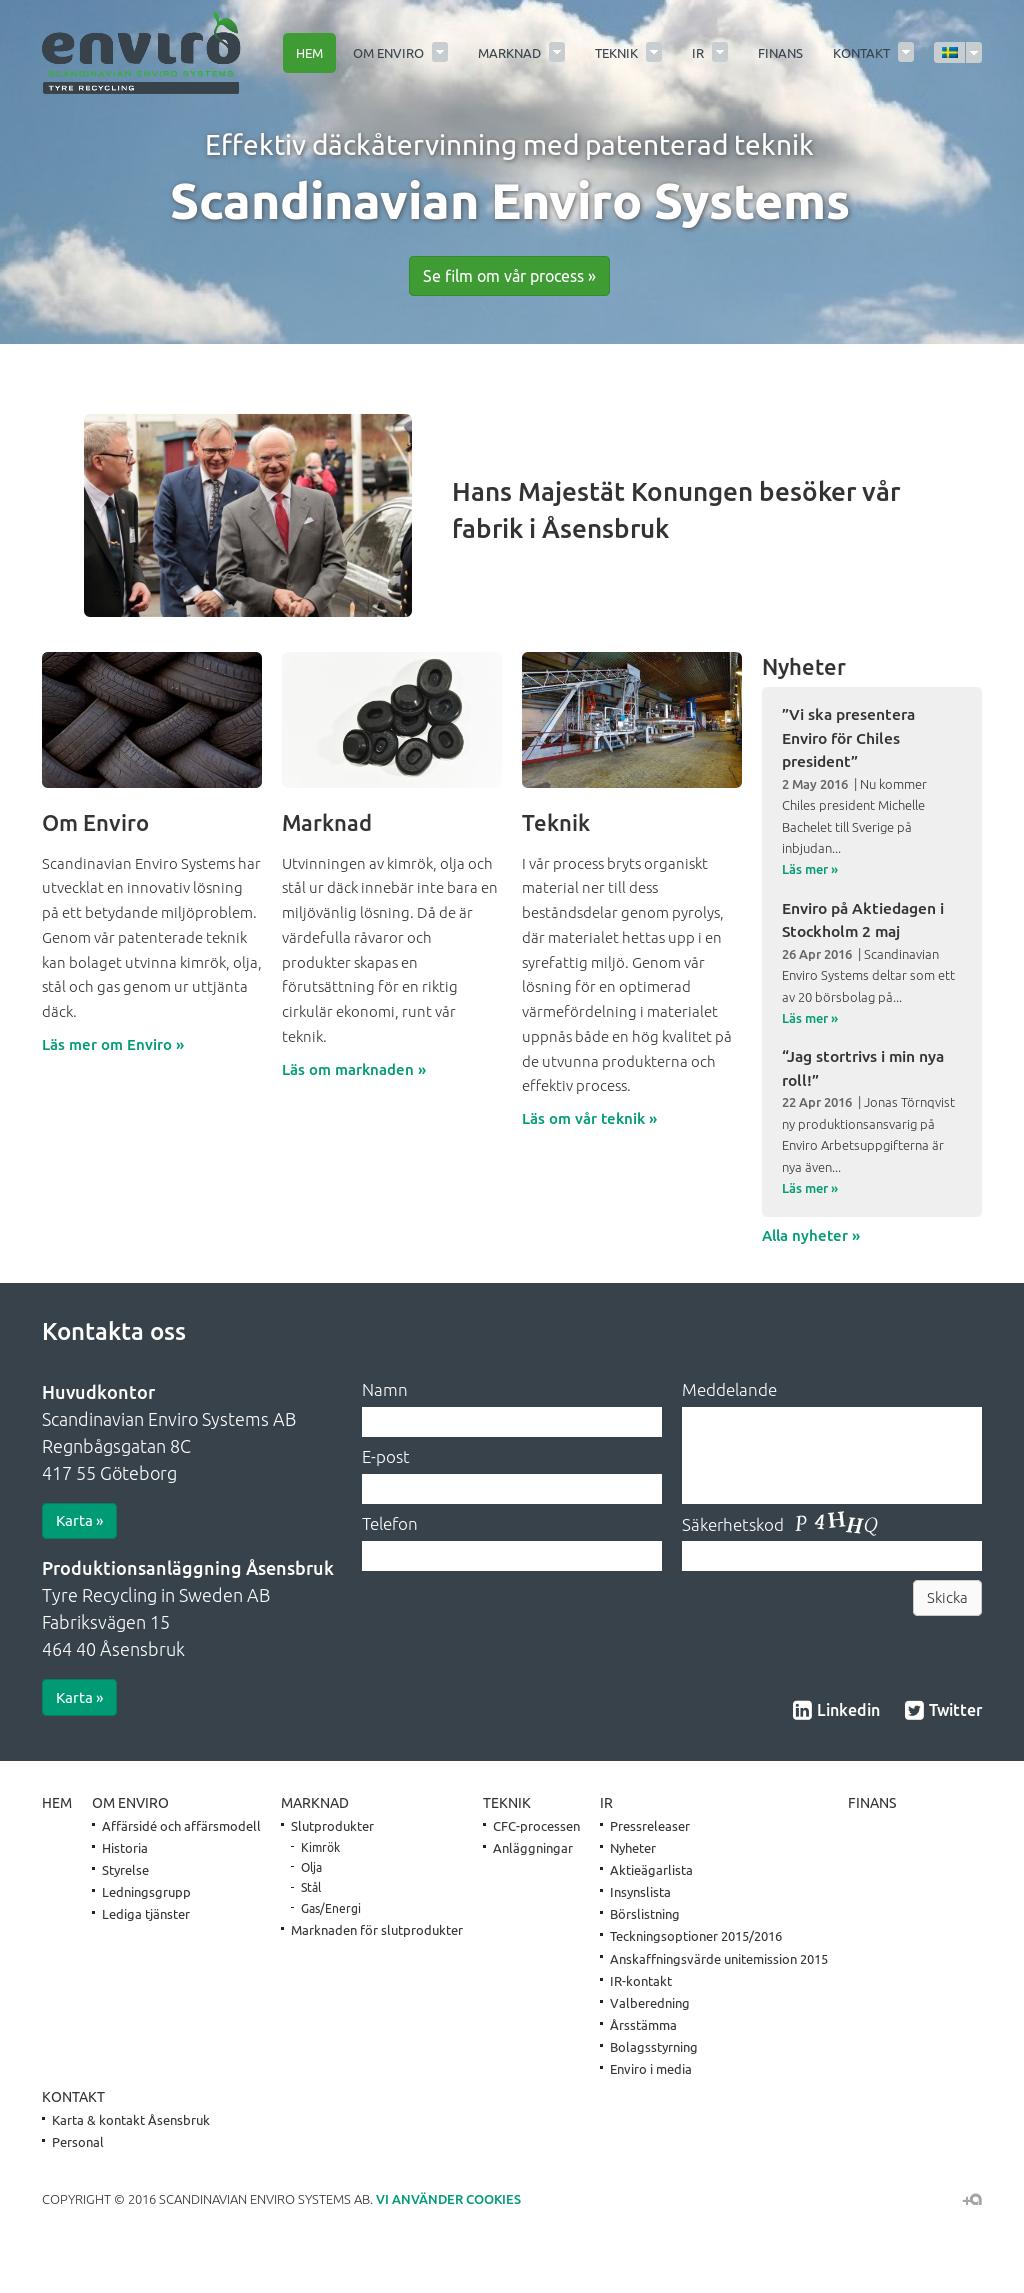 Scandinavian Enviro Systems Competitors, Revenue and